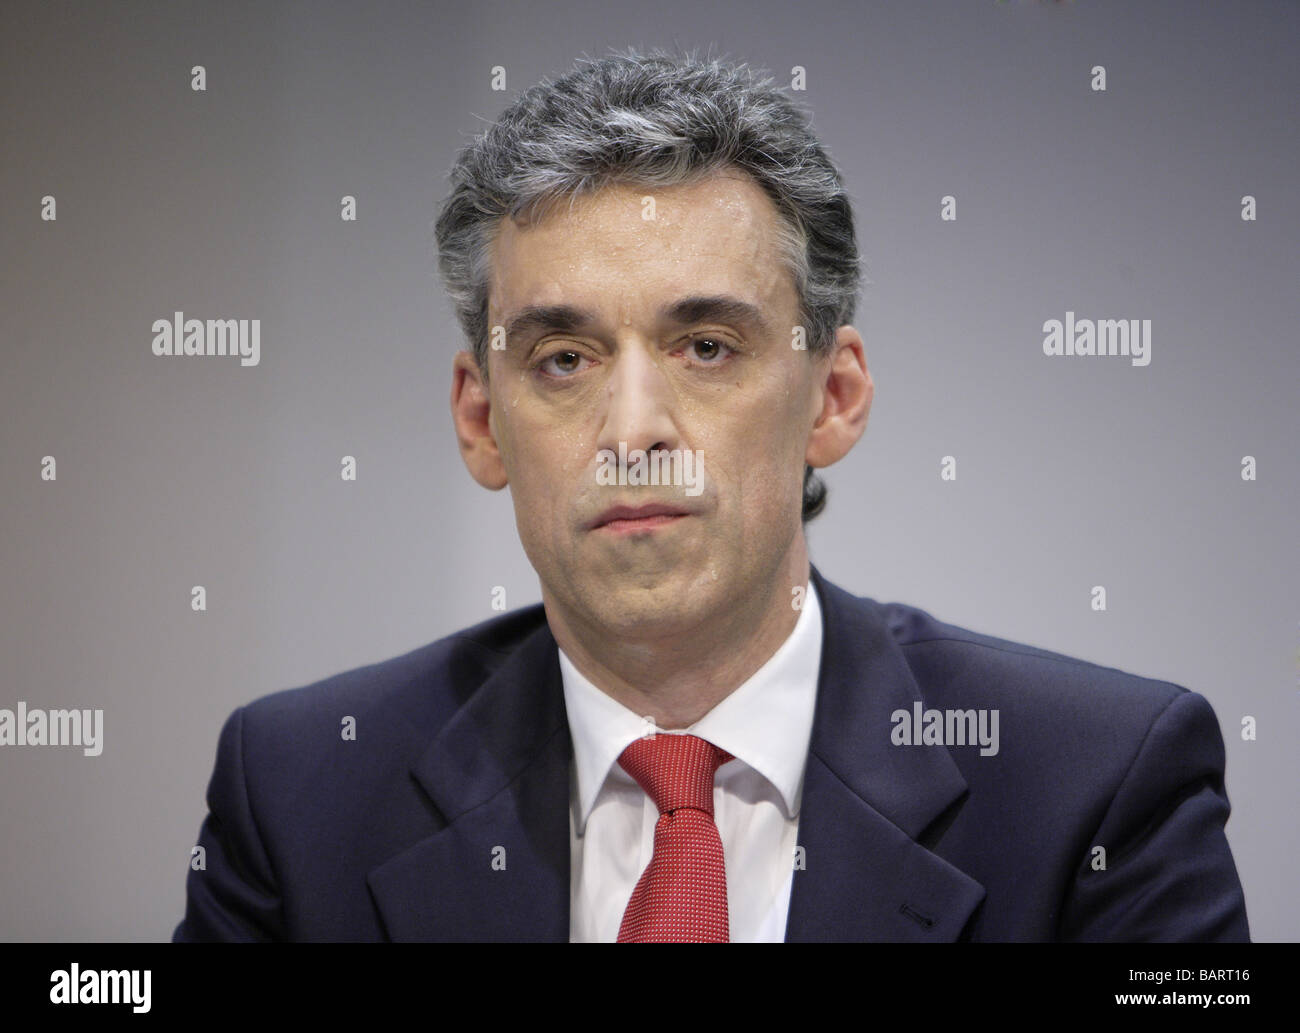 Frank APPEL CEO of Deutsche Post AG Bonn Germany - Stock Image